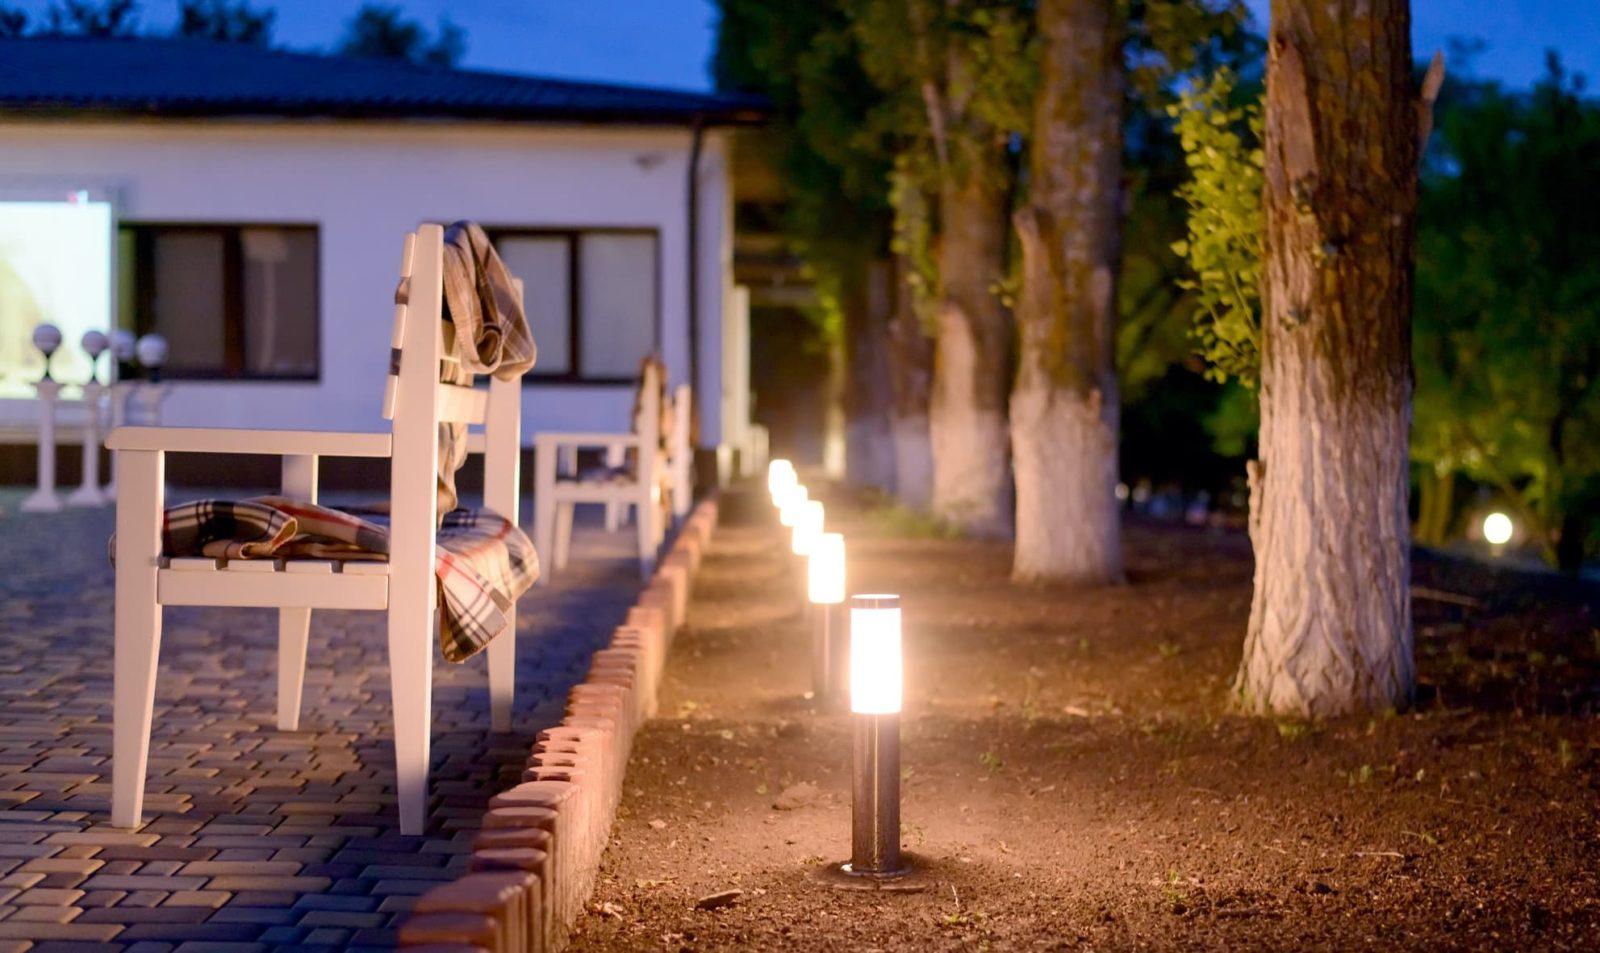 garden lights in a row